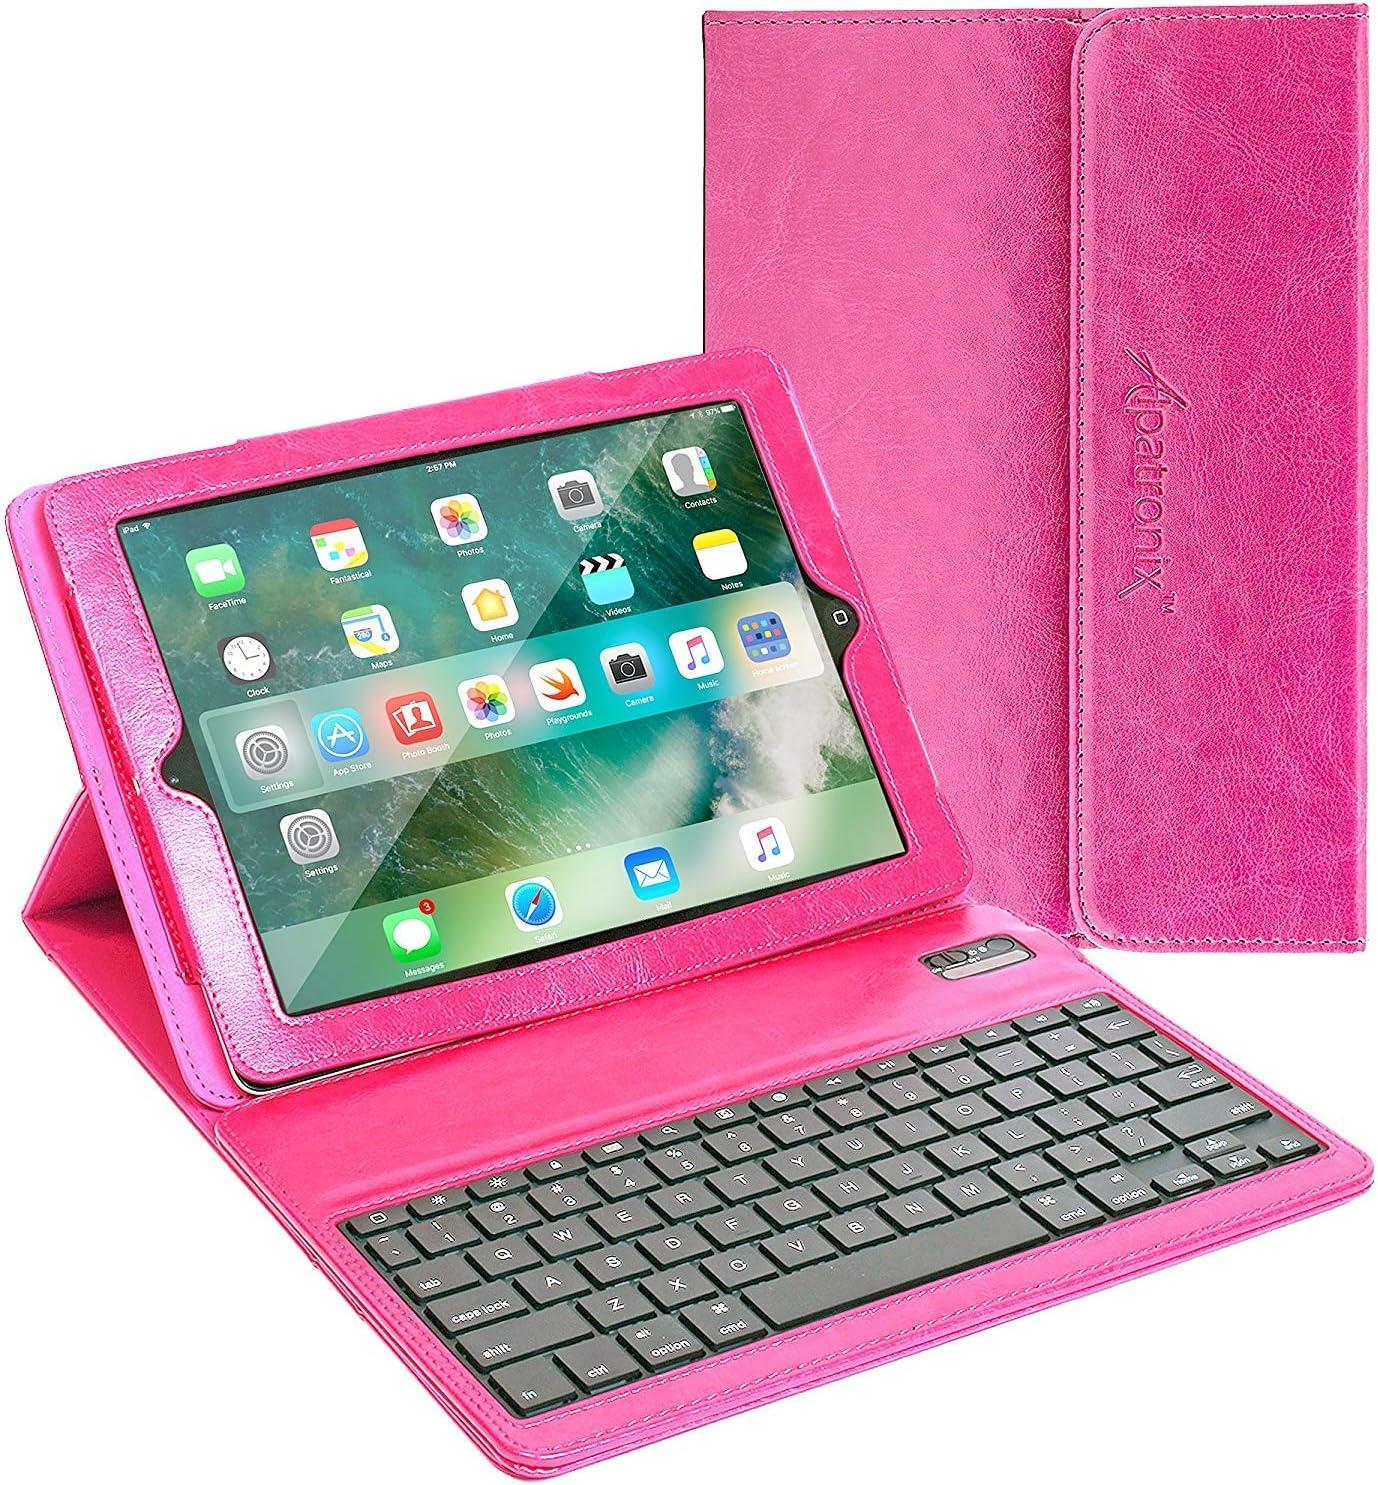 iPad Case with Keyboard, 9.7 inch Alpatronix KX130 Leather iPad Cover w/Detachable Wireless Bluetooth Keyboard Compatible w/Apple iPad 6 (2018), iPad 5 (2017), iPad Pro 9.7 & iPad Air 2/1 – Pink